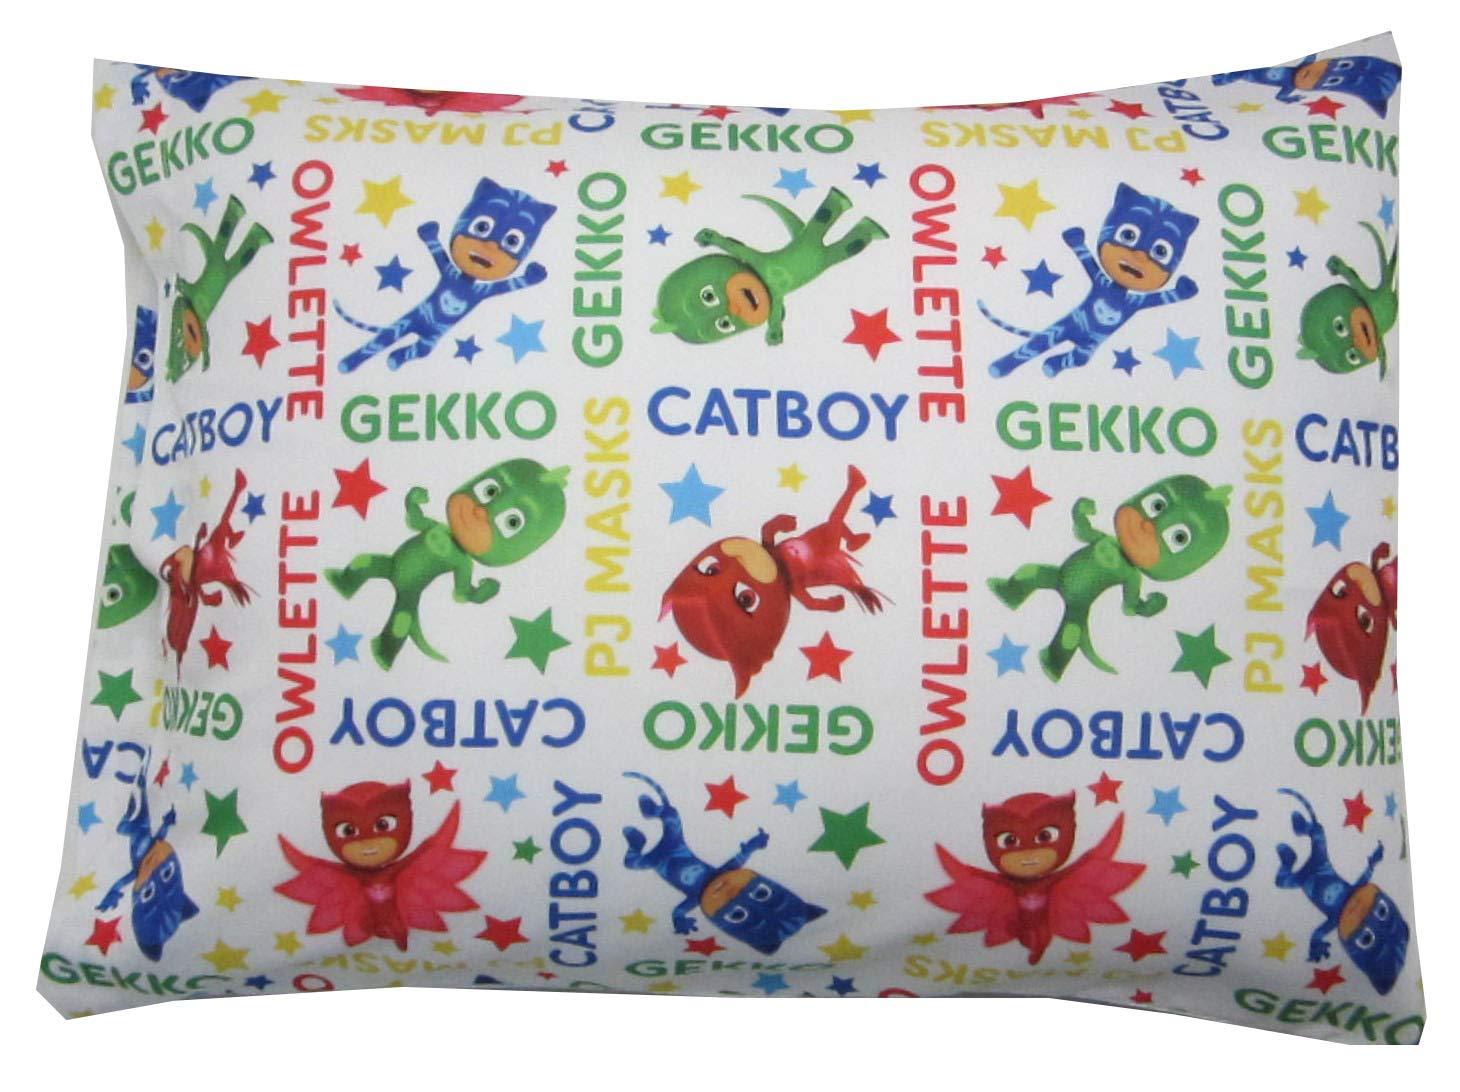 Toddler Pillowcase 16x20 PJ Masks Catboy Owlete Gekko Fits Size 14x19 Pillow Kids Bedding